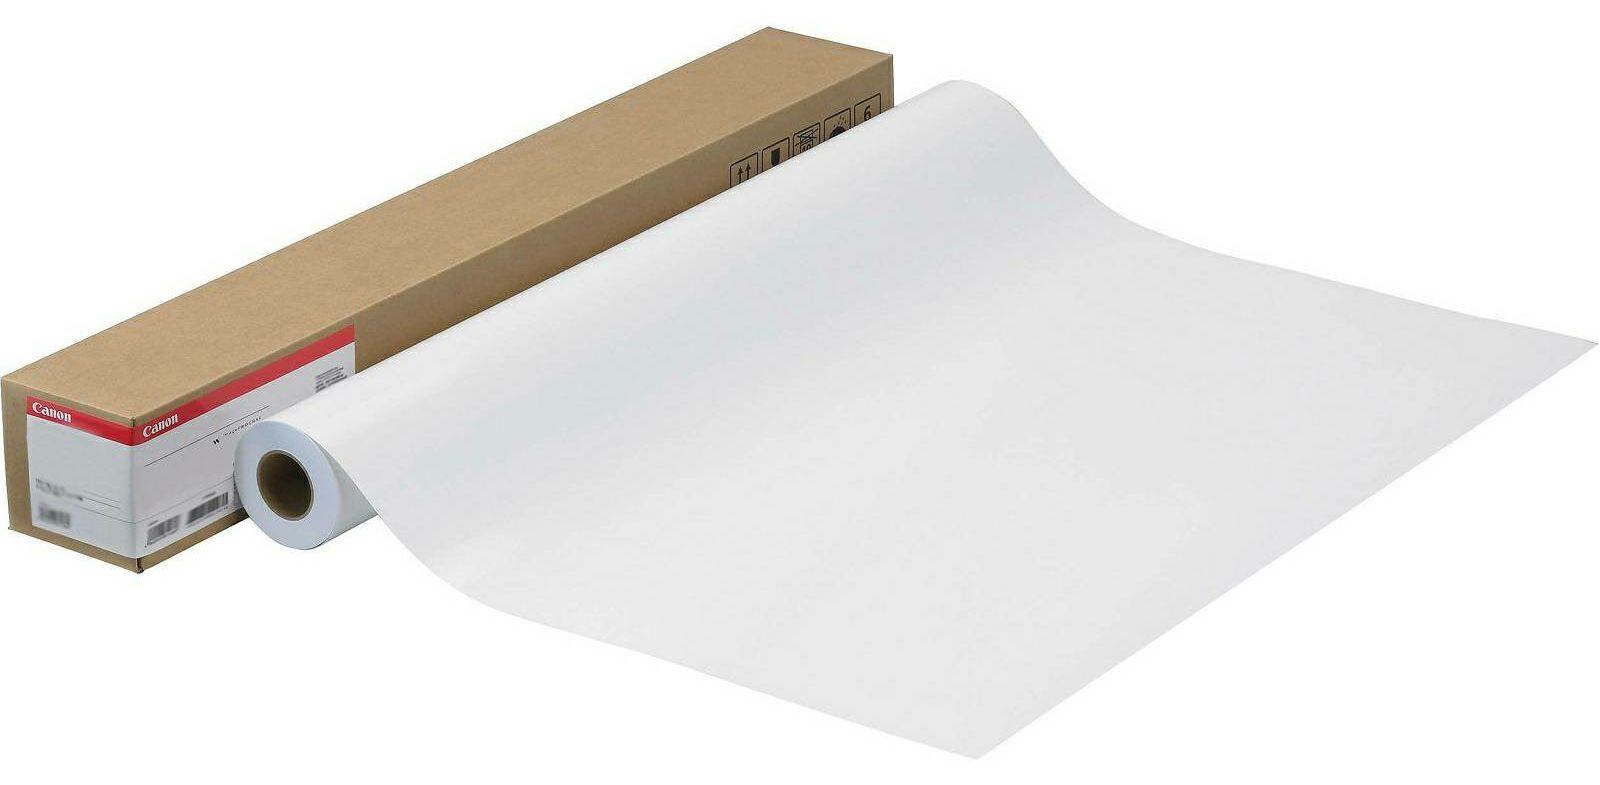 Canon Matt Coated Paper 140gsm 24